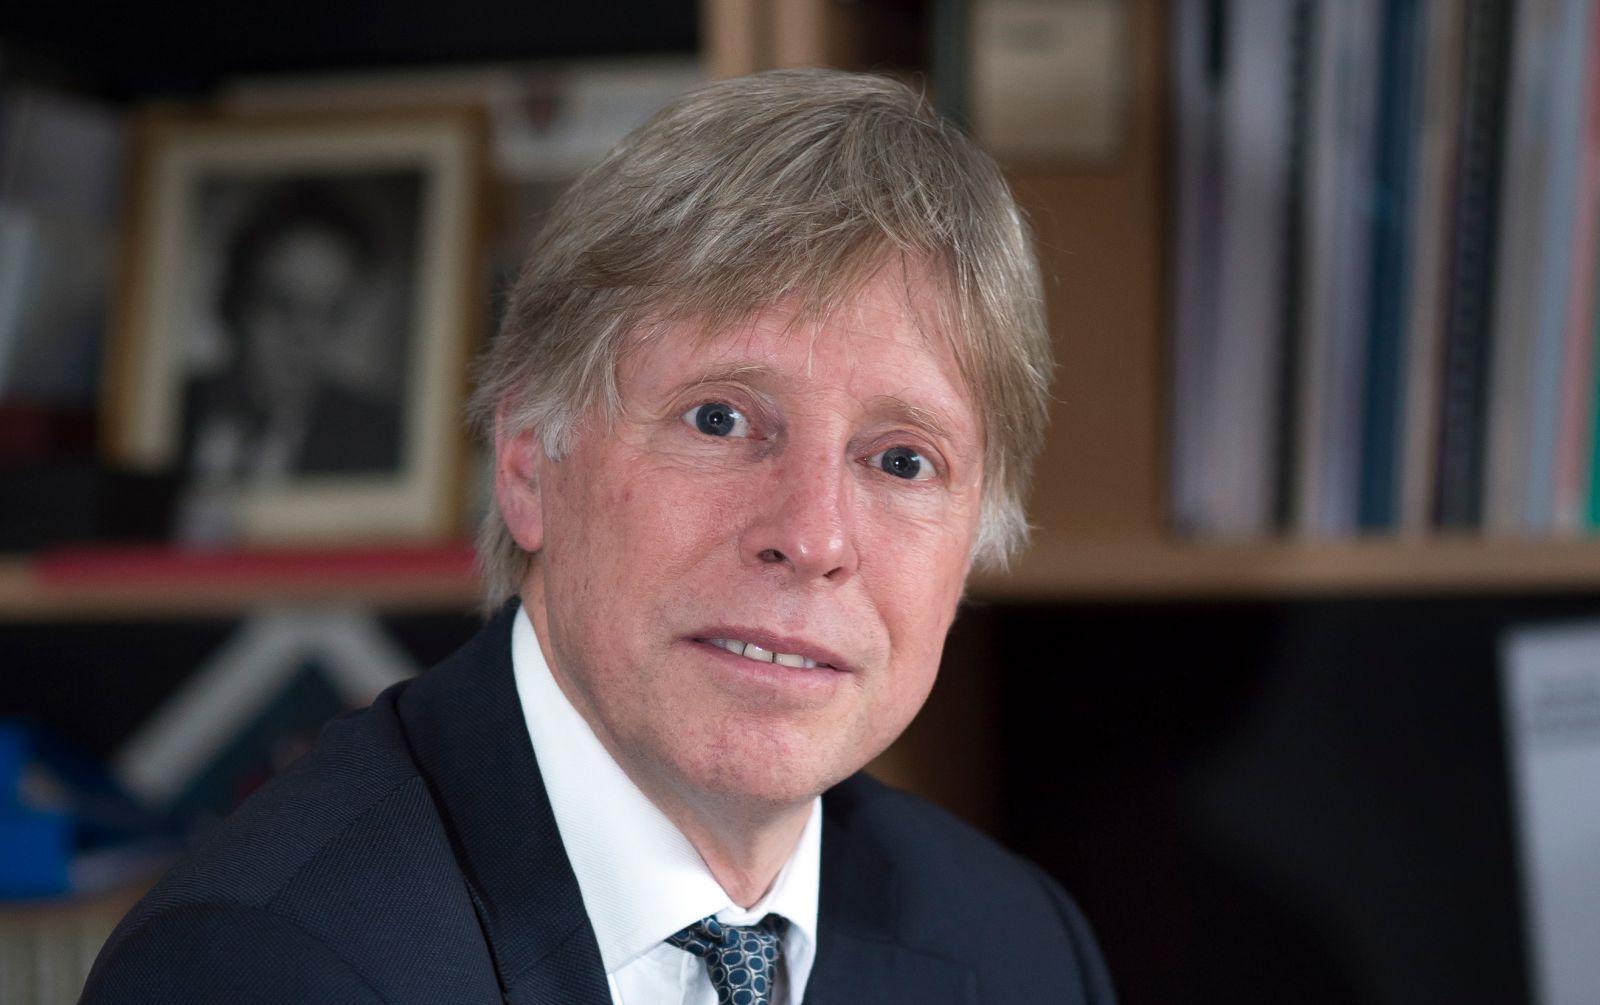 Professor Stephen Shute